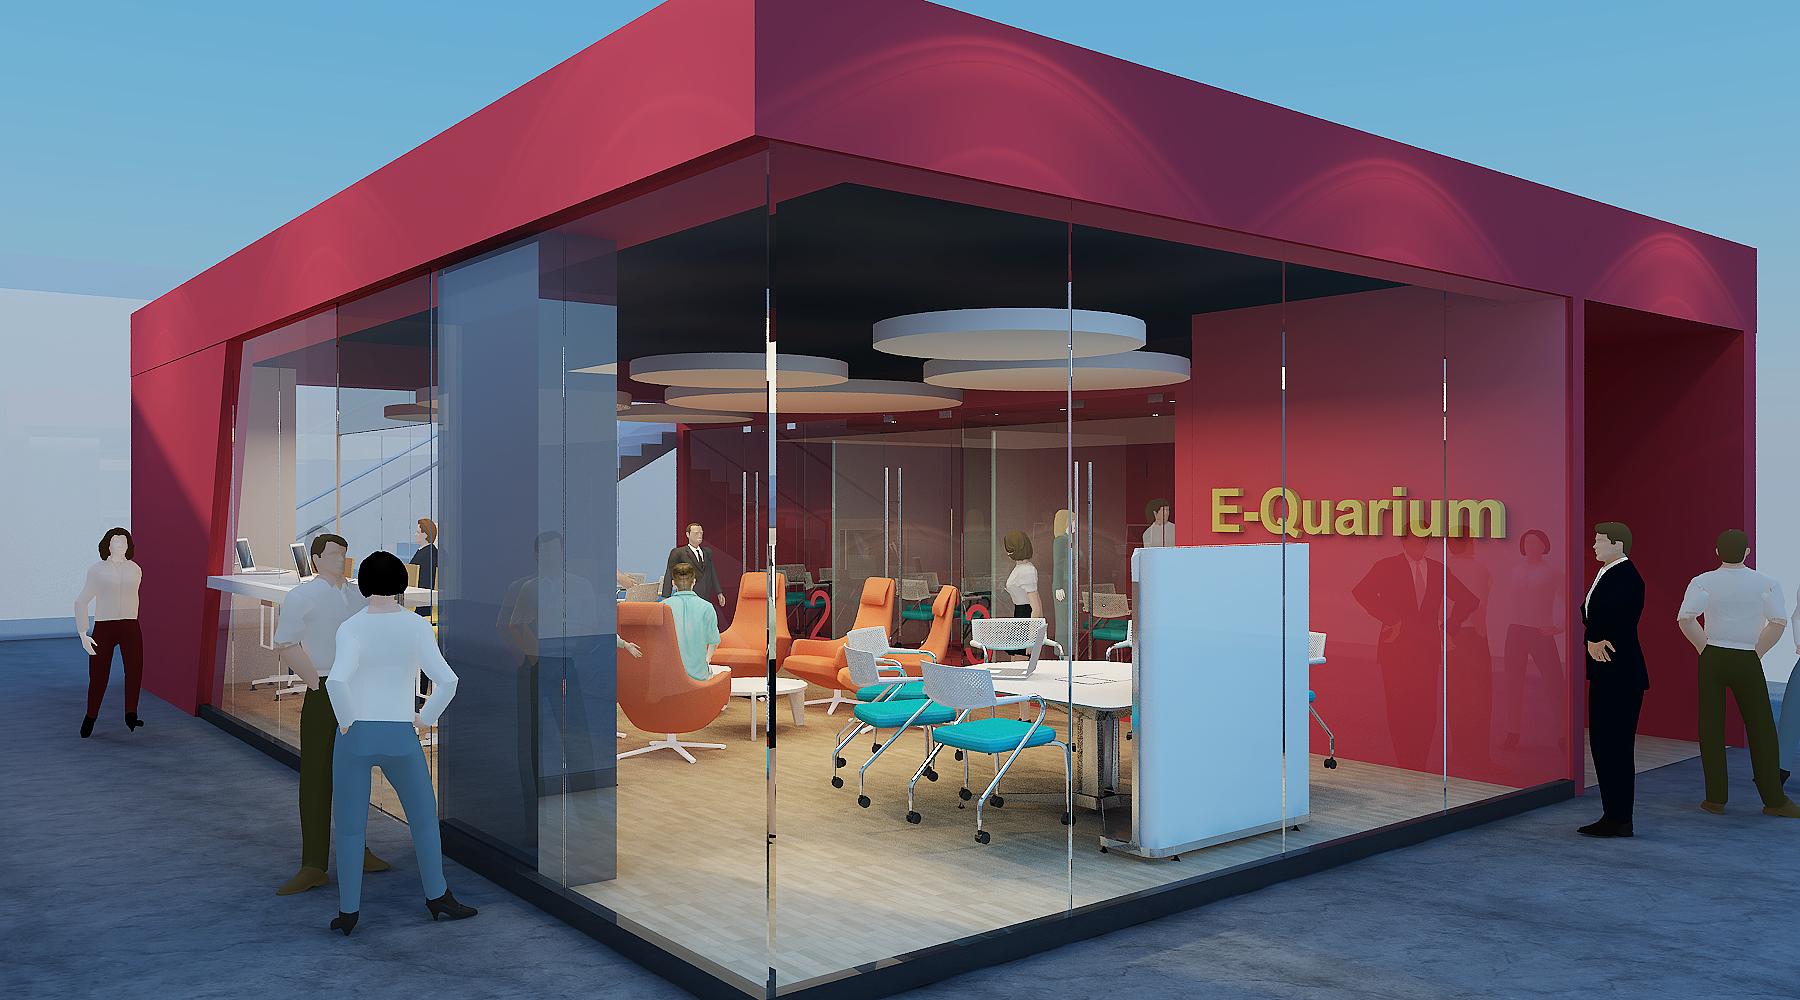 Taylor's E-Quarium